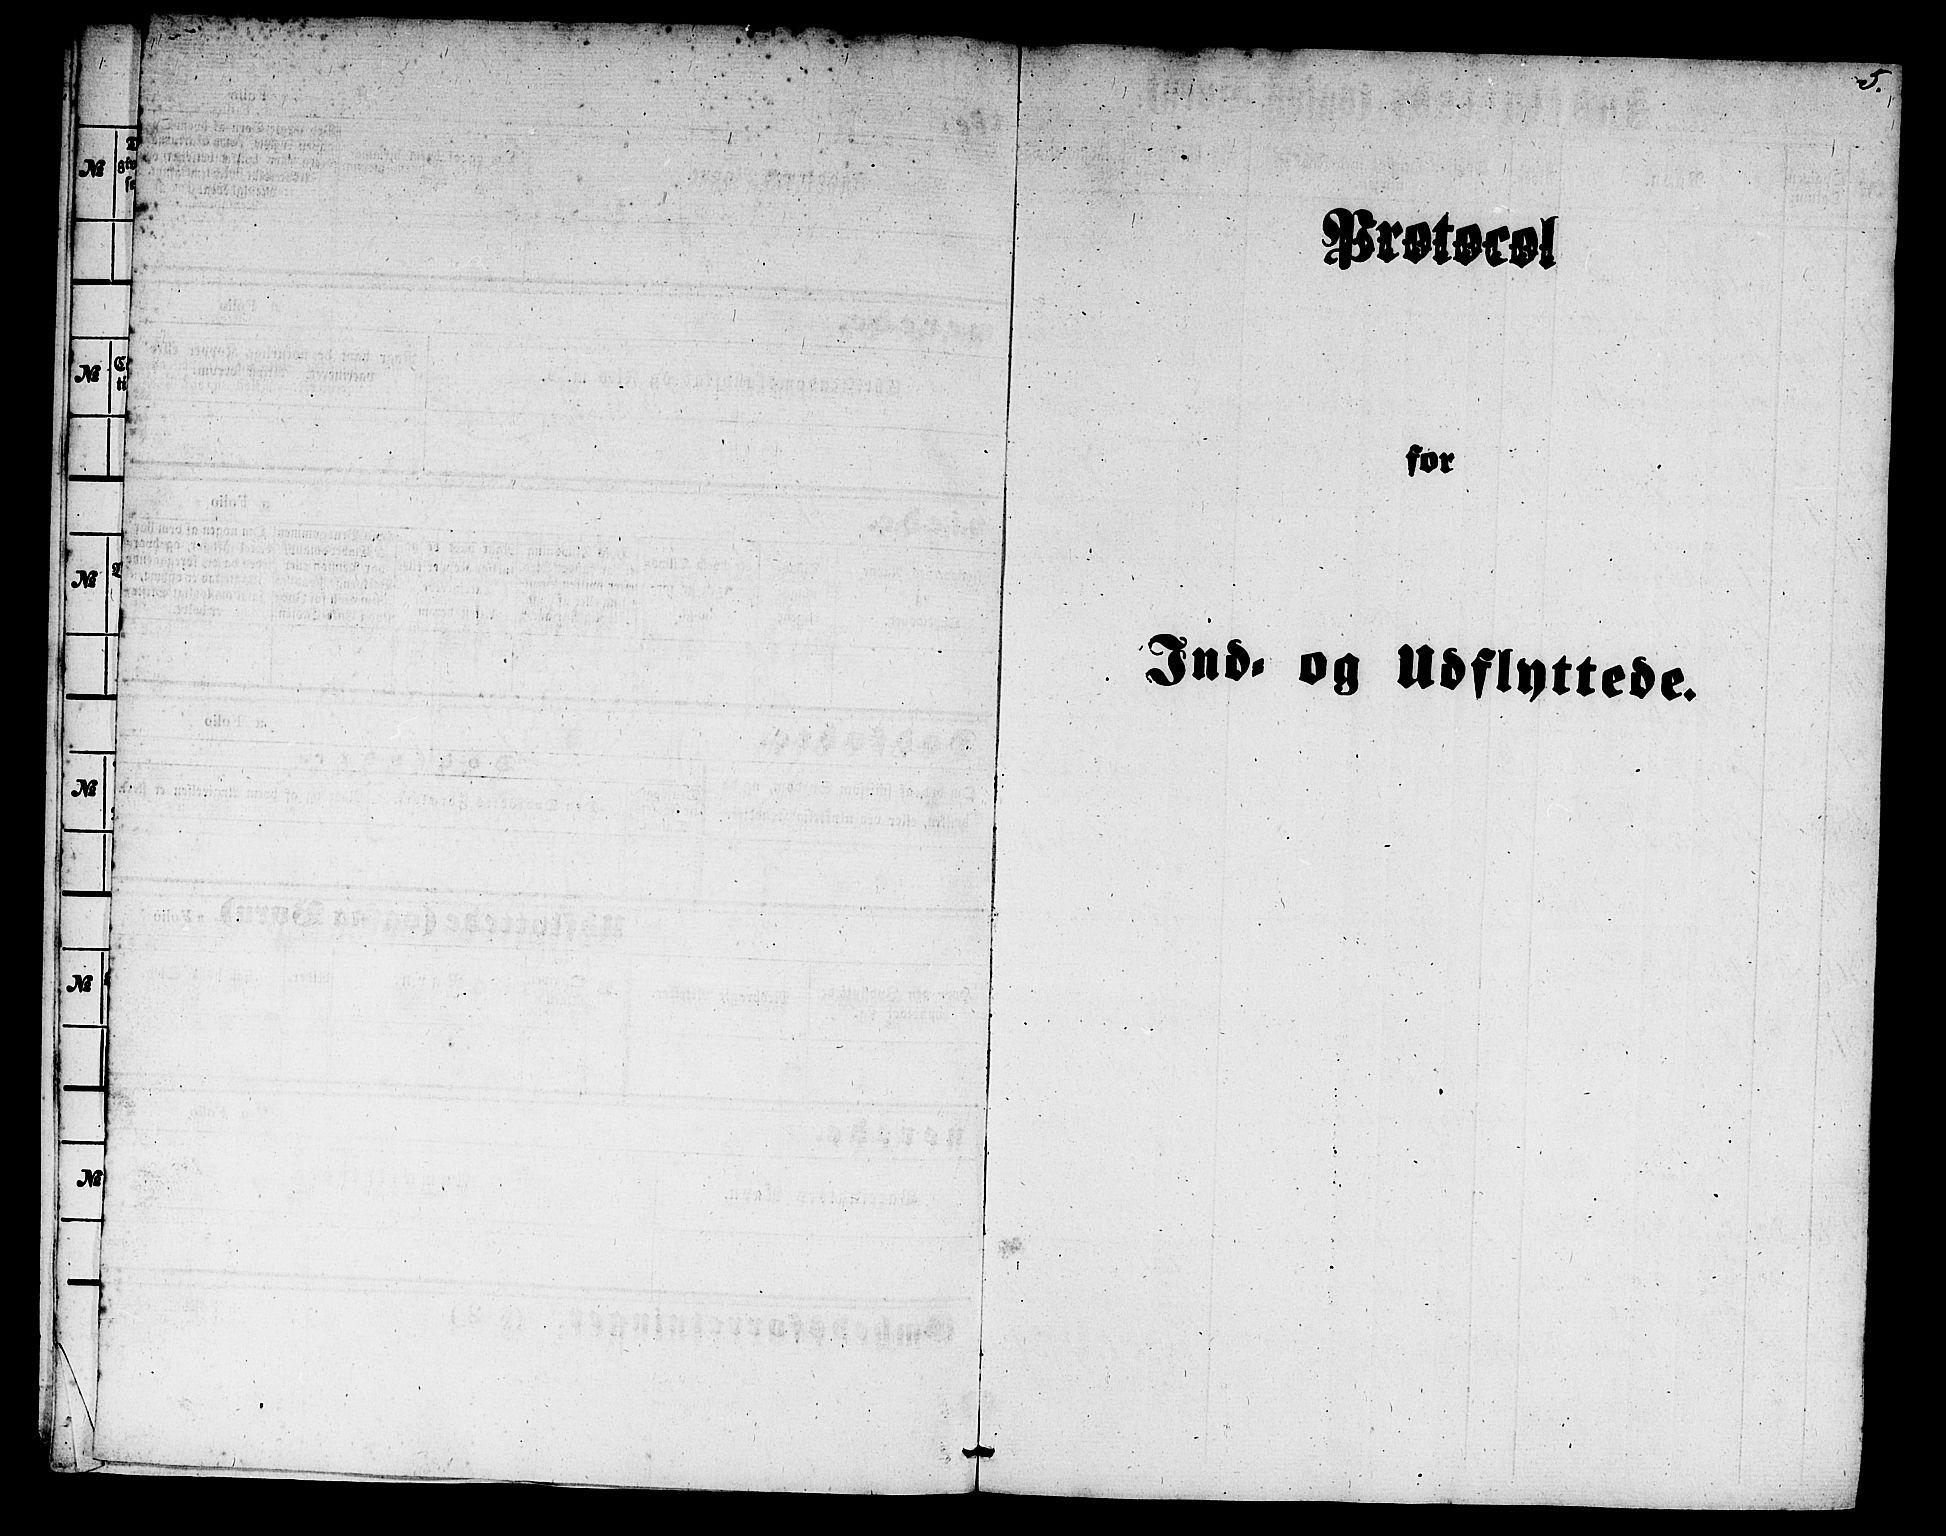 SAB, Domkirken Sokneprestembete, H/Hab/L0044: Klokkerbok nr. F 1, 1856-1879, s. 5